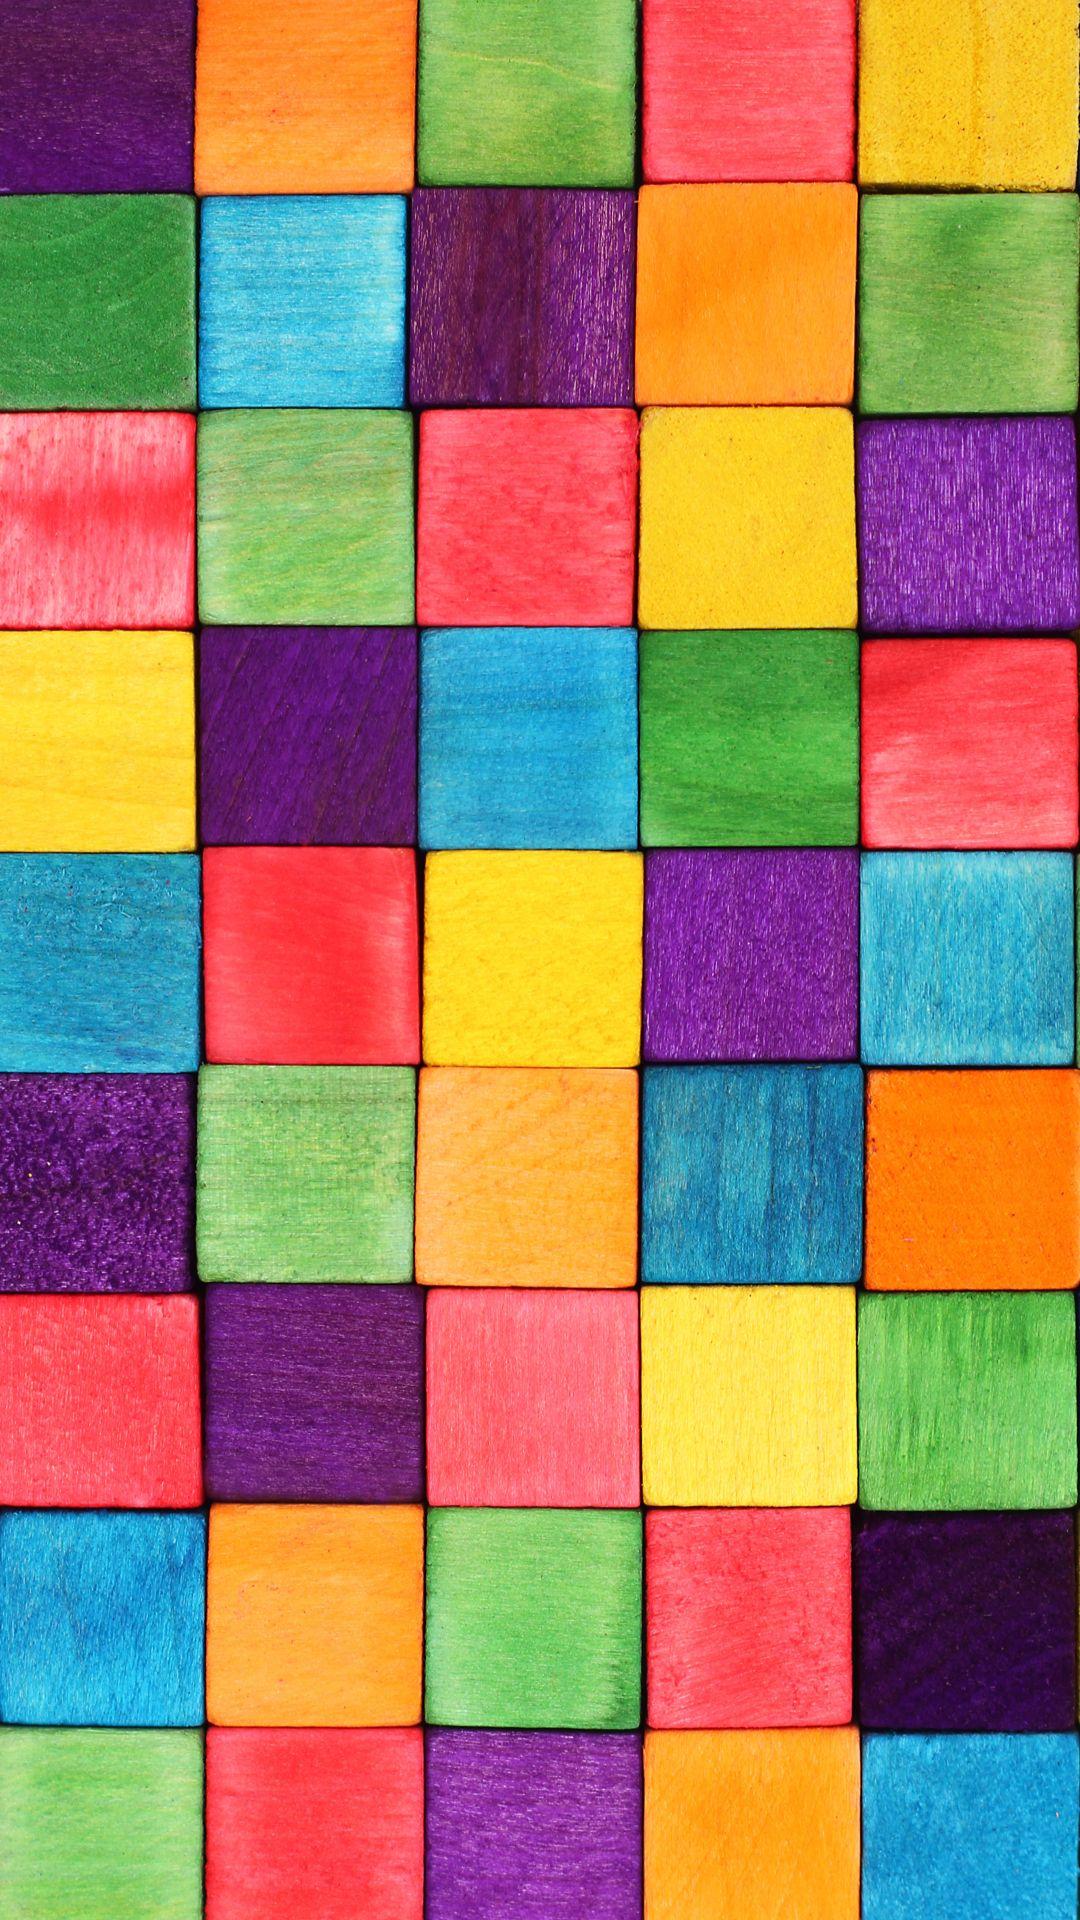 Rainbow Tile Pattern Iphone Wallpaper